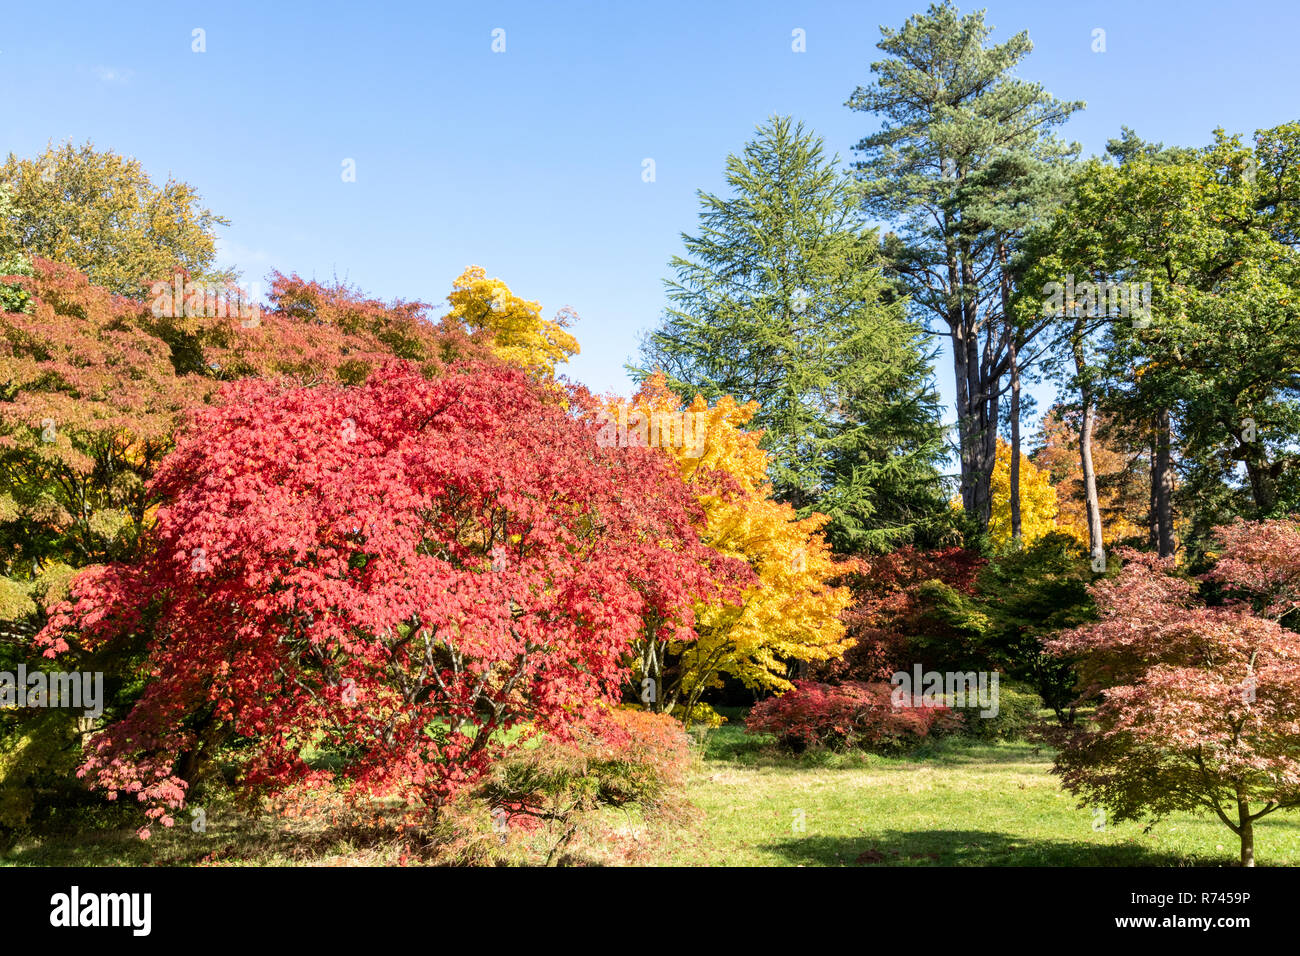 Autumn colours at Westonbirt Arboretum, Gloucestershire UK - Stock Image